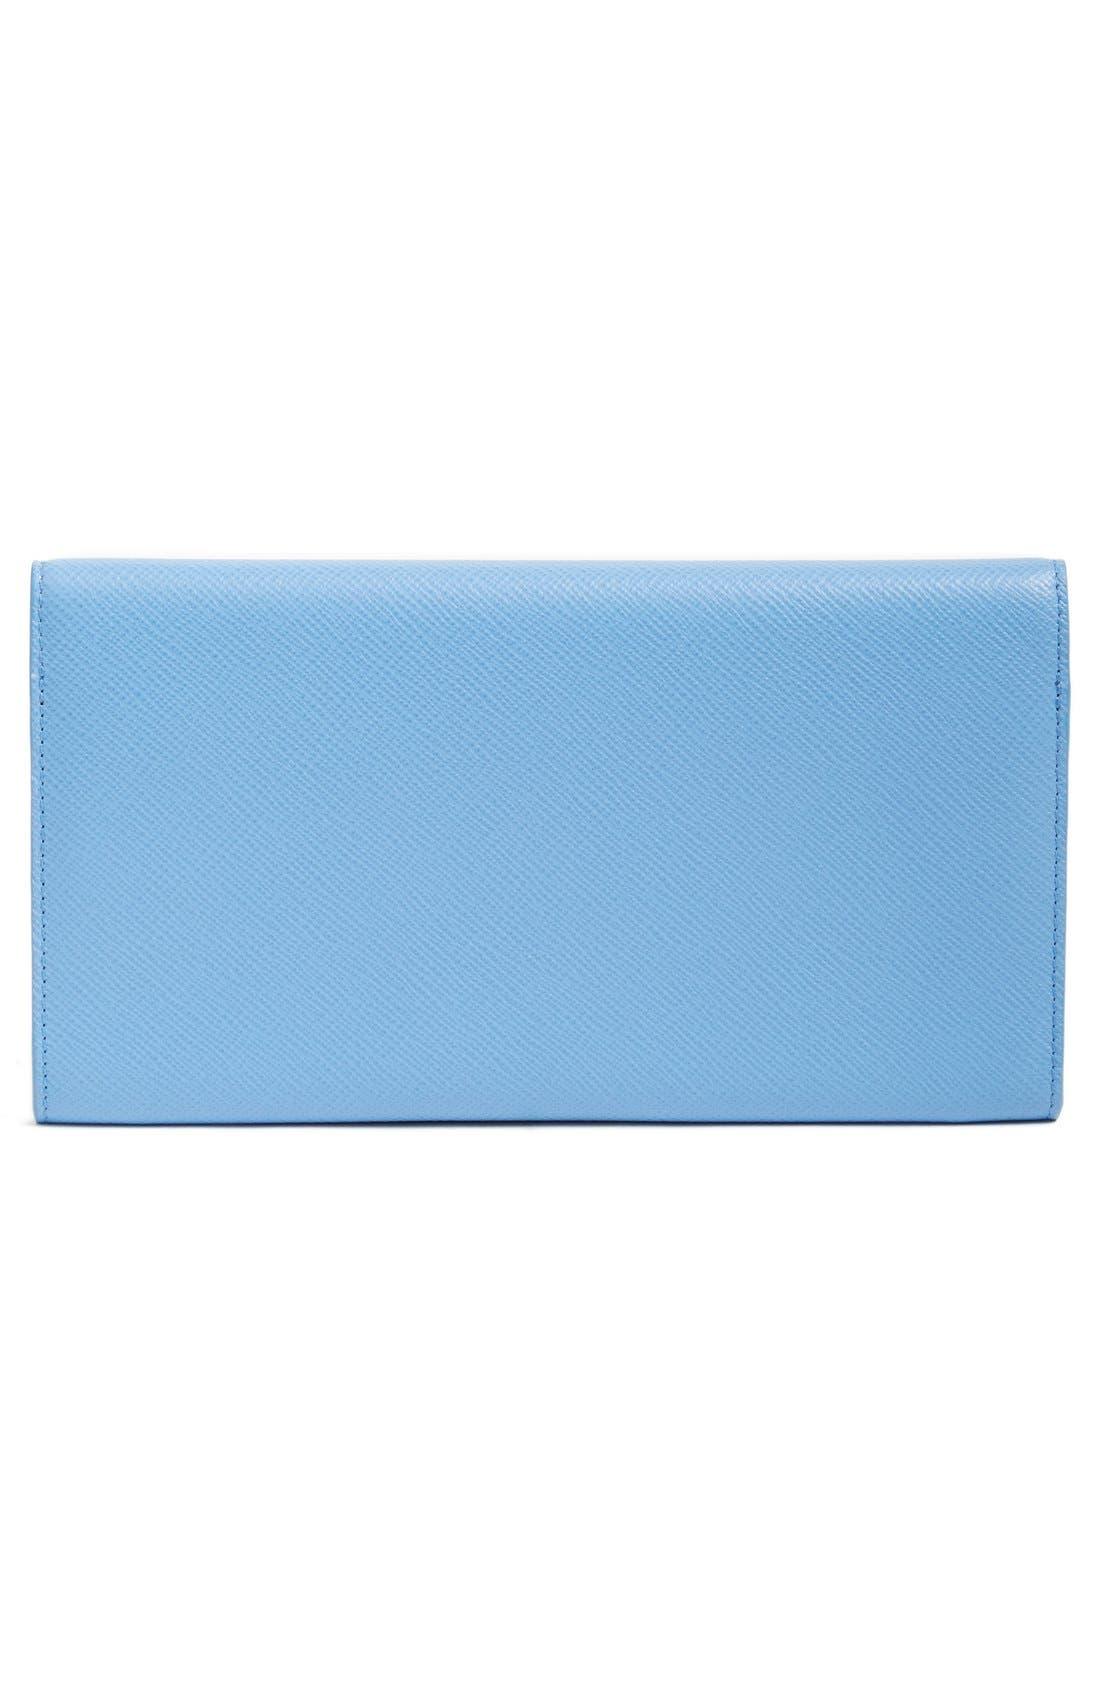 'Panama Marshall' Travel Wallet,                             Alternate thumbnail 4, color,                             Nile Blue